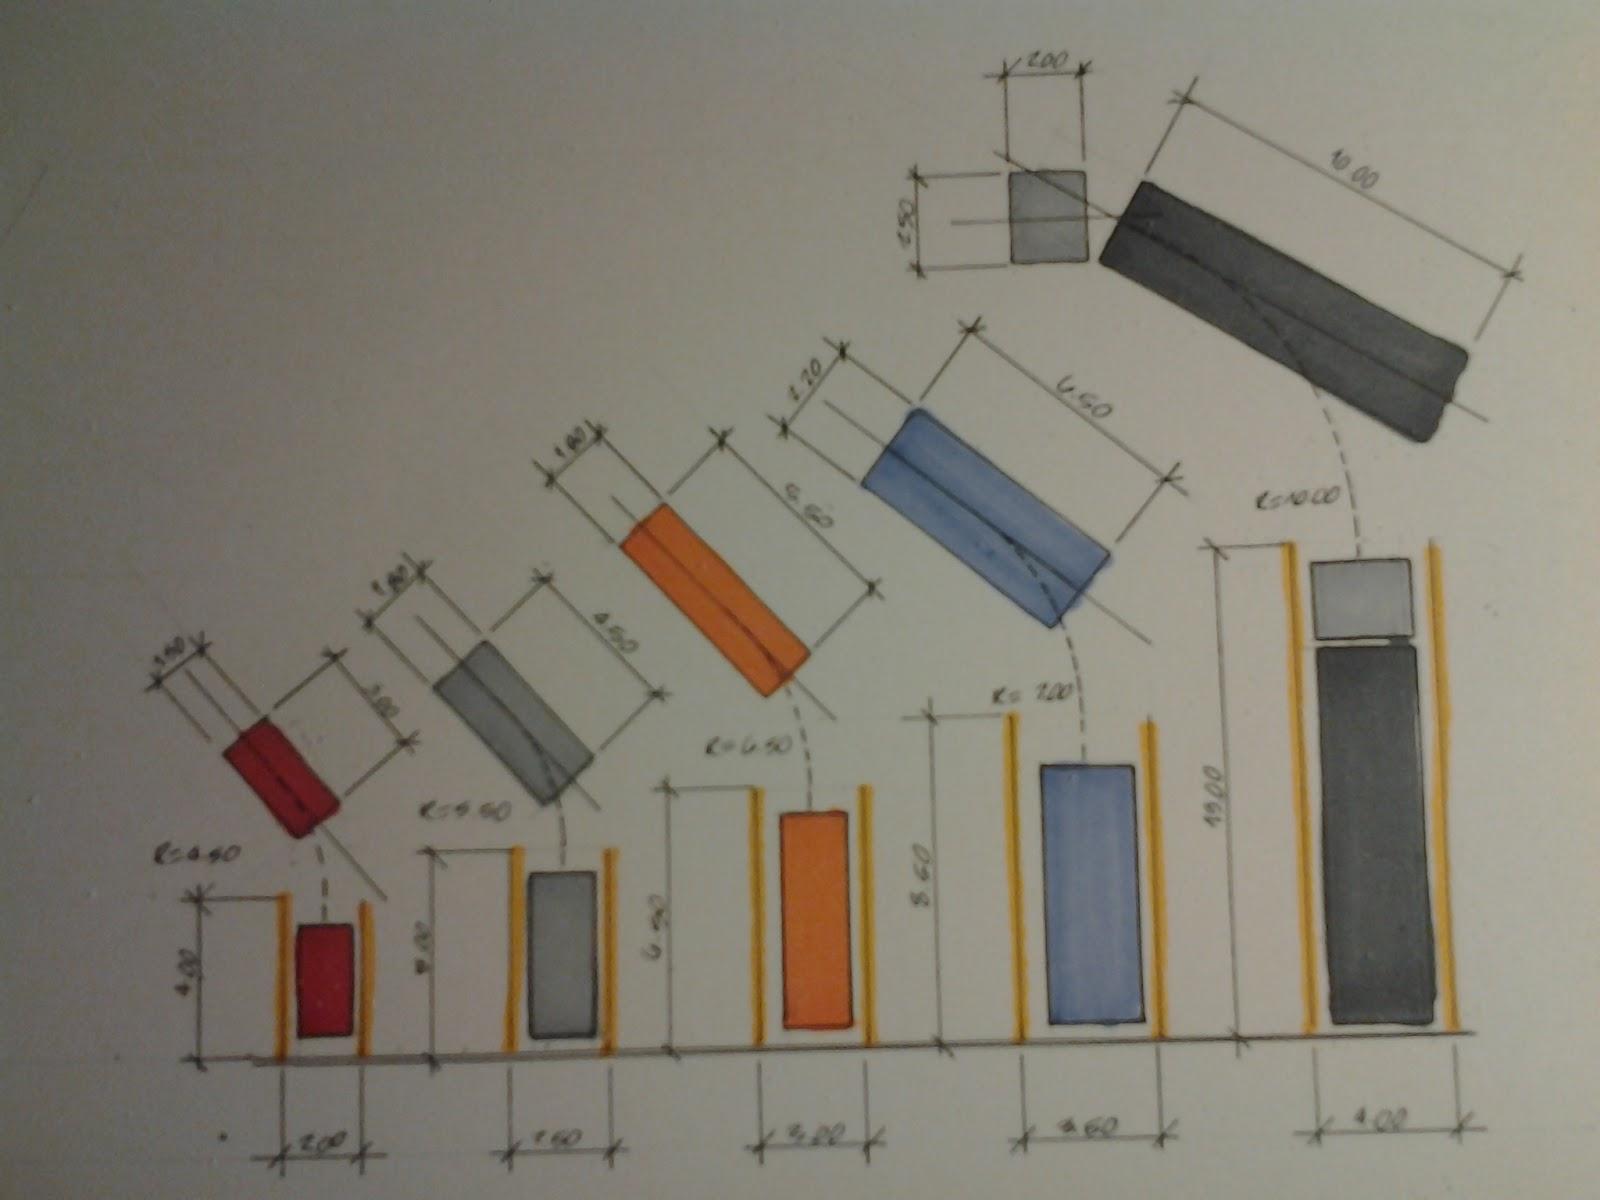 Arquitectura dise o arquitect nico 2 for Medidas de un carro arquitectura